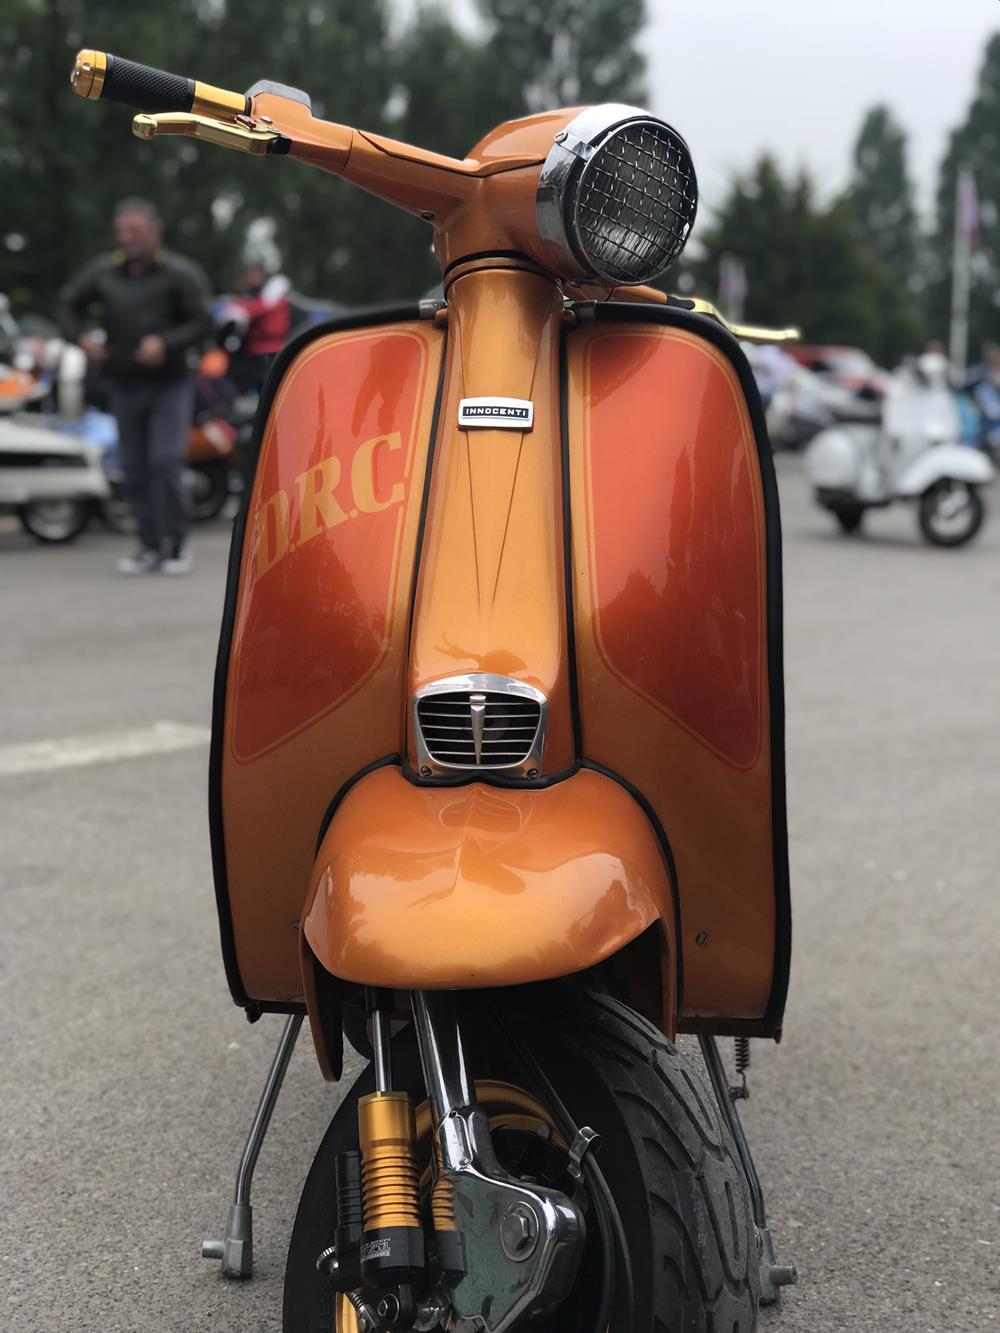 Orange Lambretta with DRC paint job